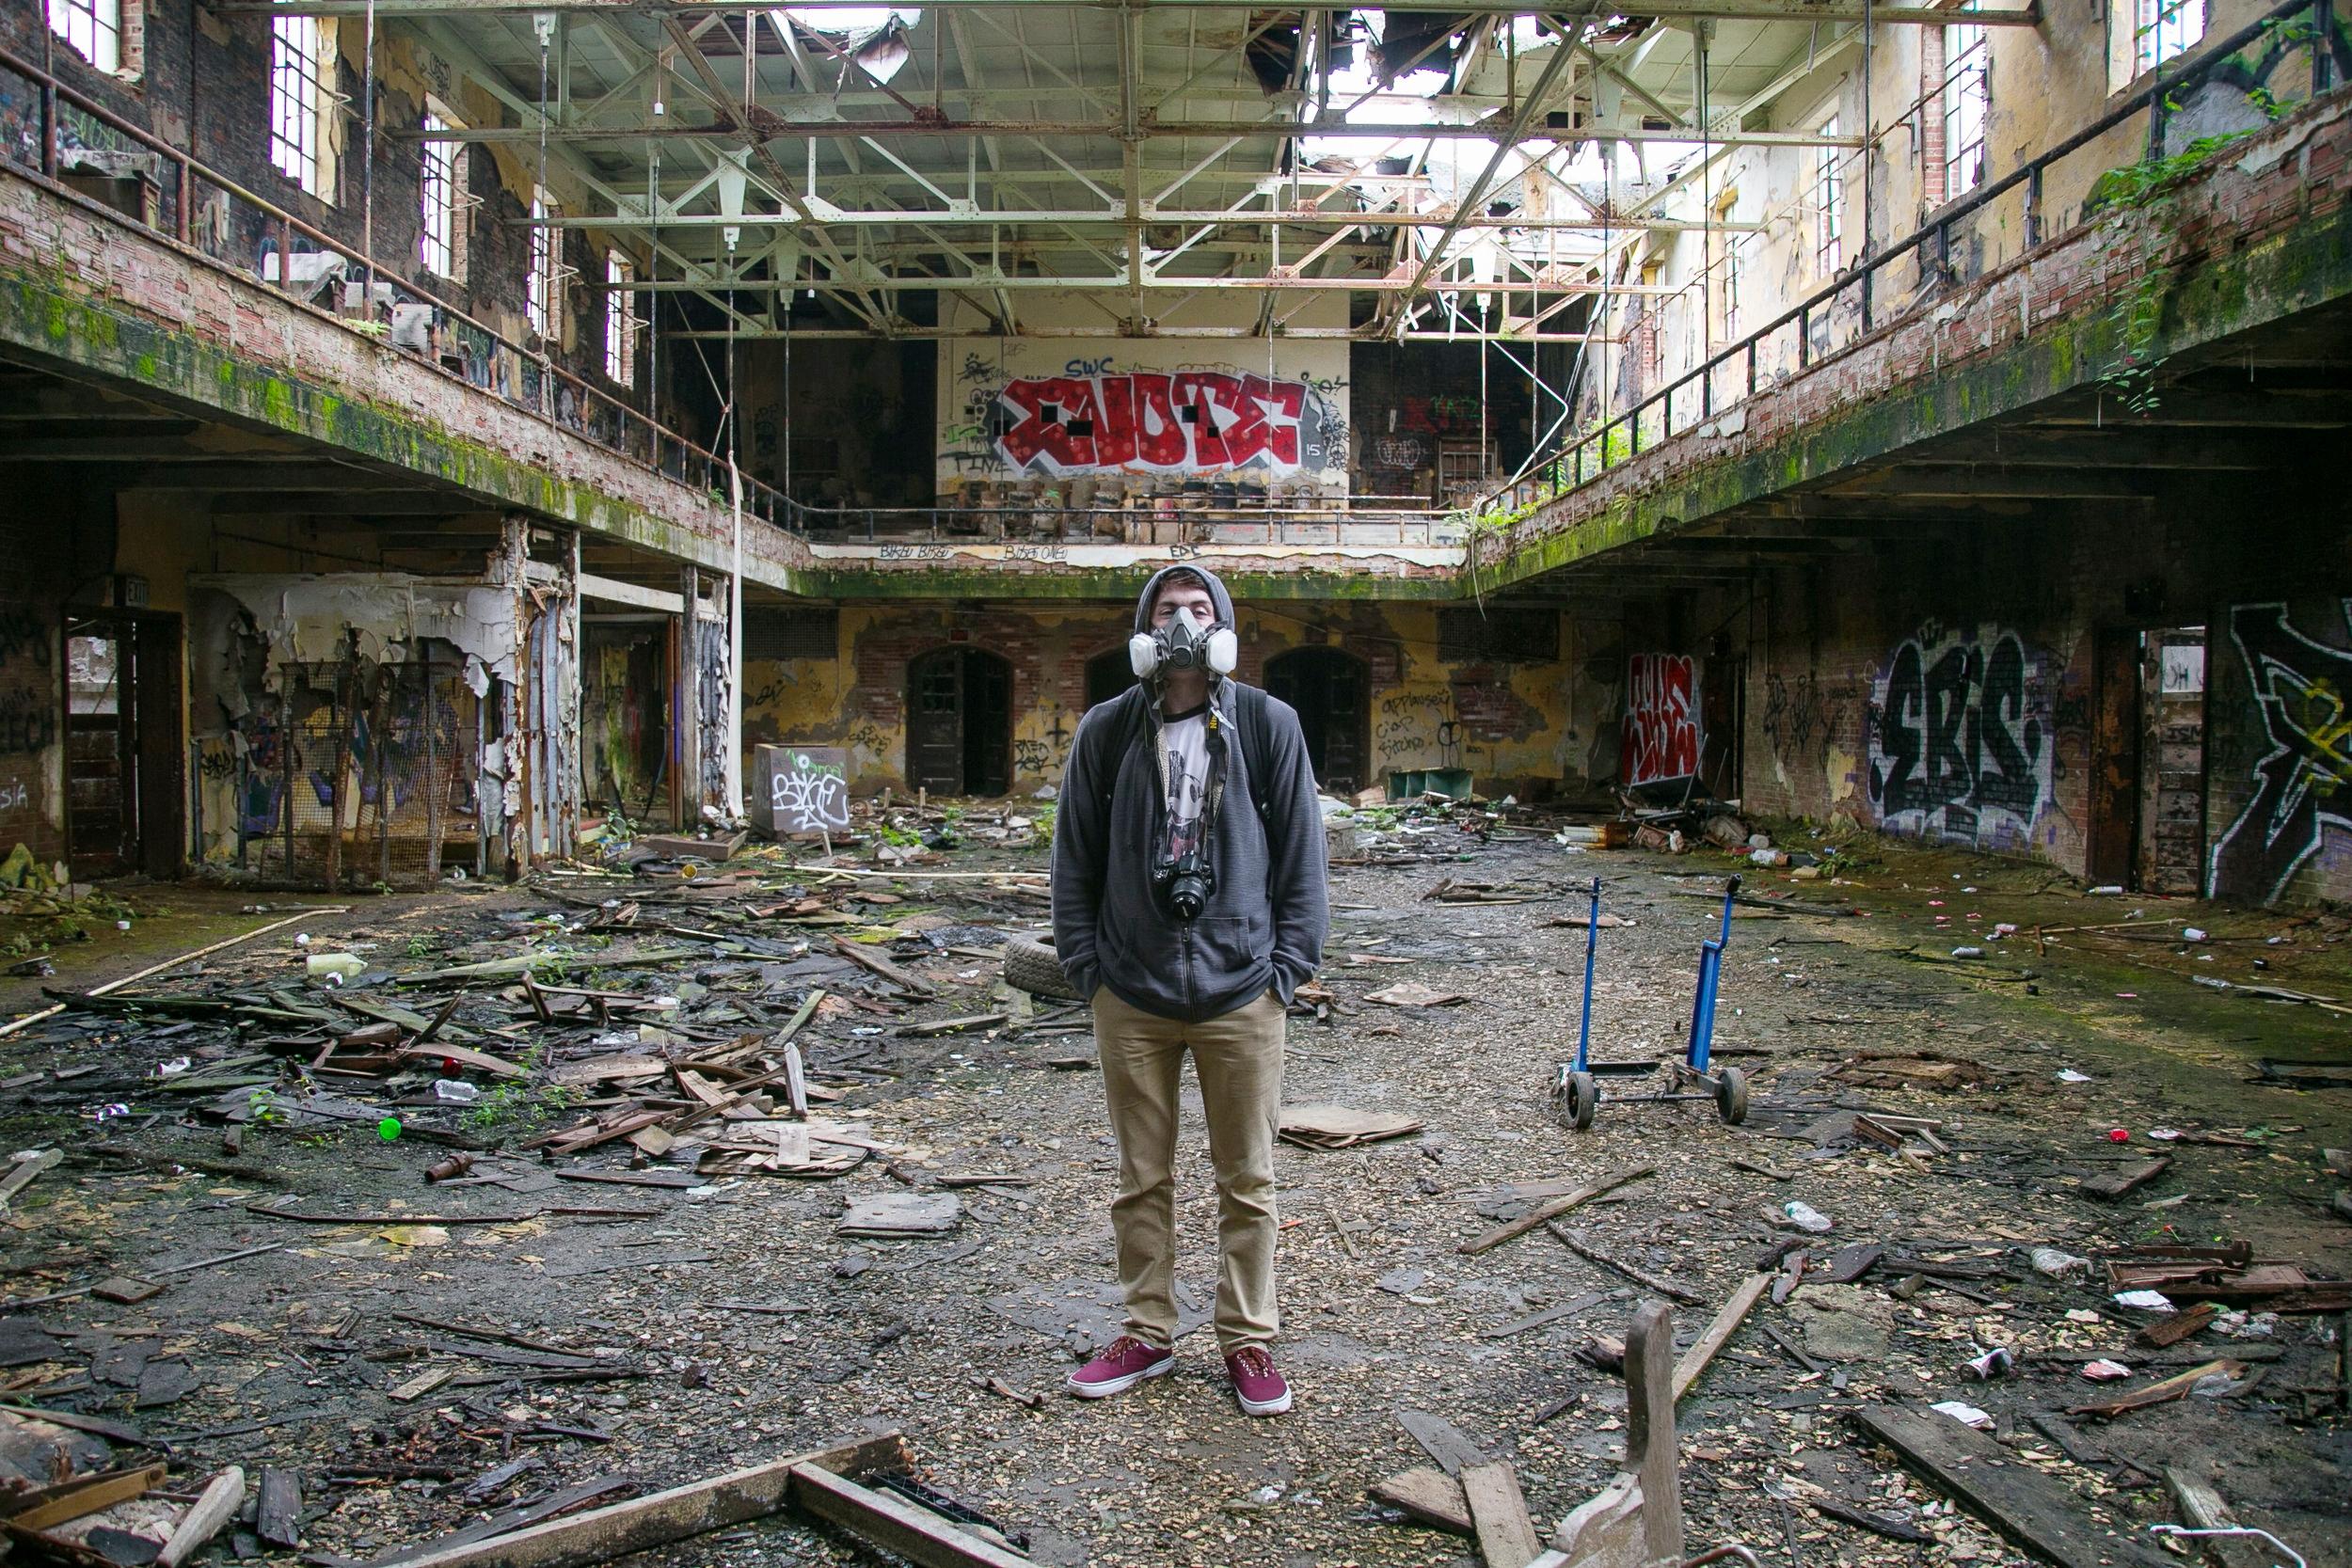 Lucas Esposito - Urban Explorer - Belchertown State School - Belchertown, MA